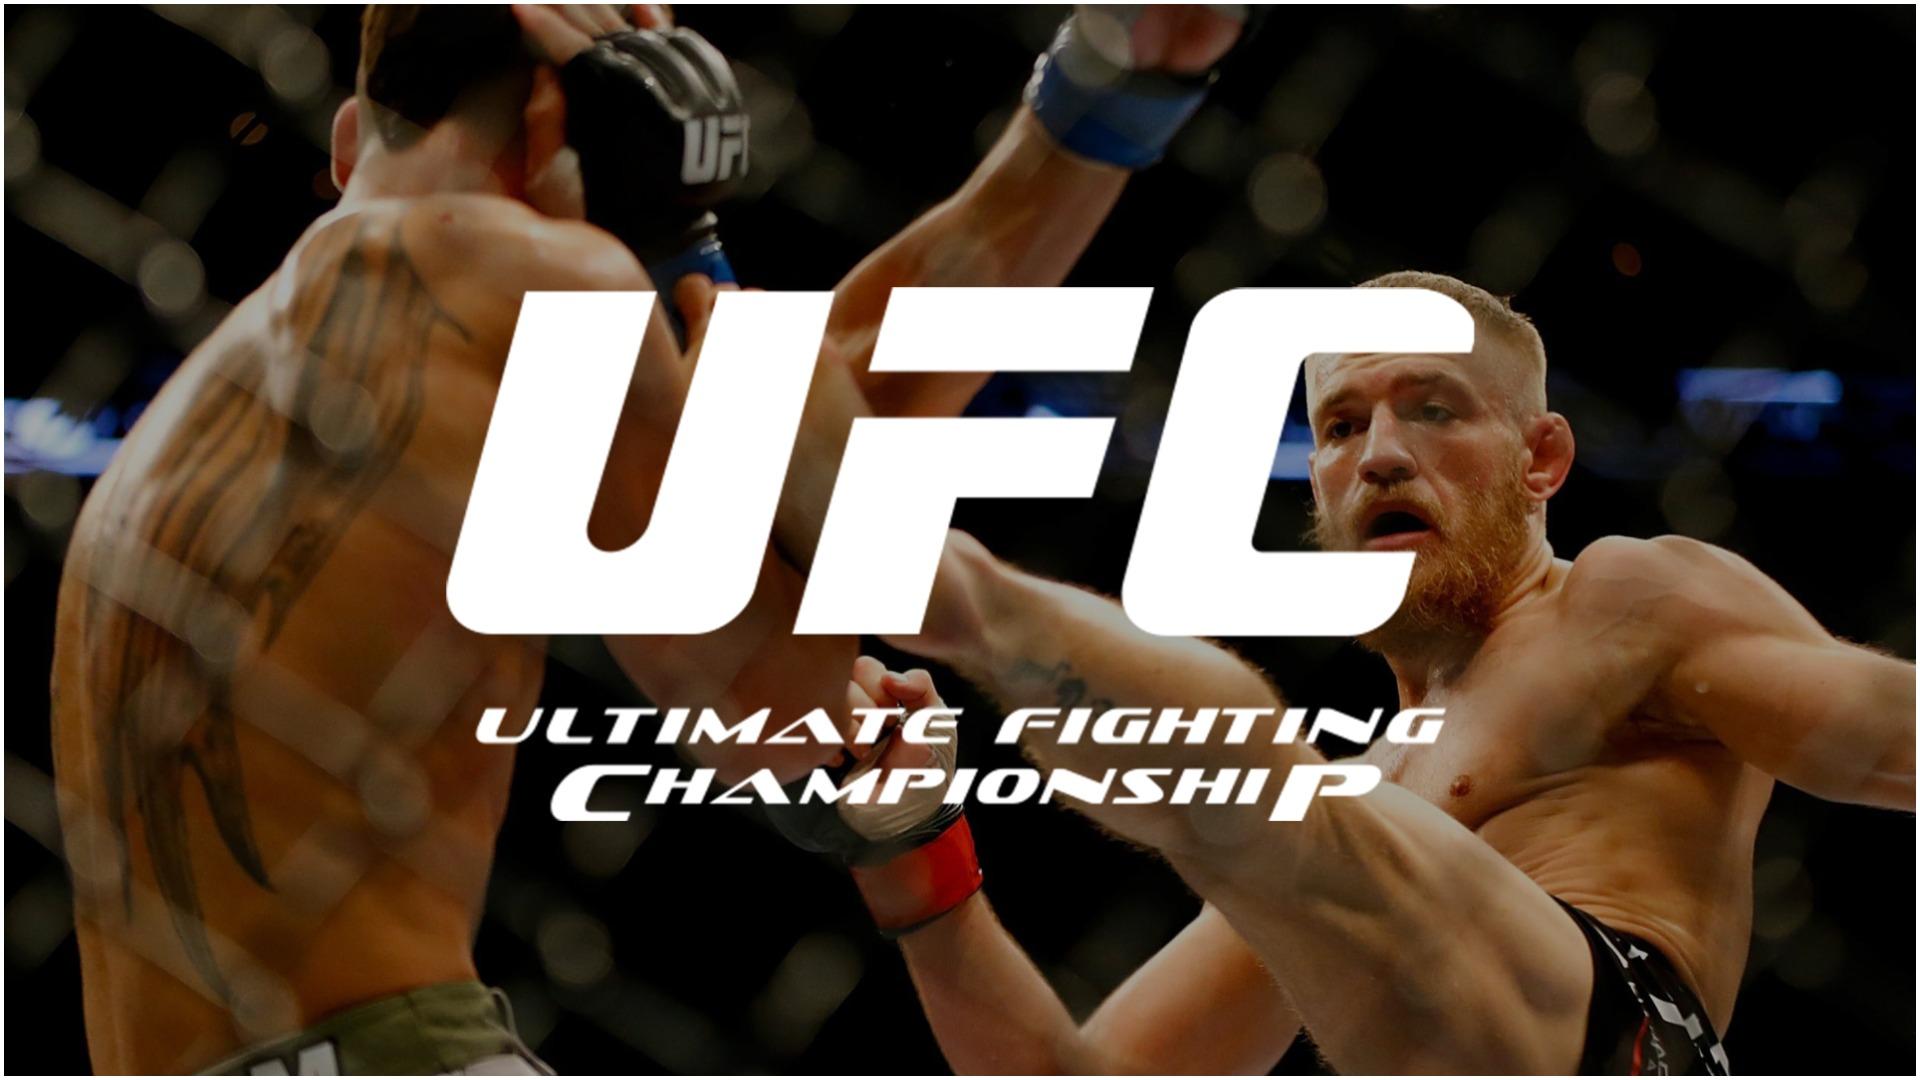 Zyrtare! Rikthehet UFC, presidenti Dana White konfirmon datën